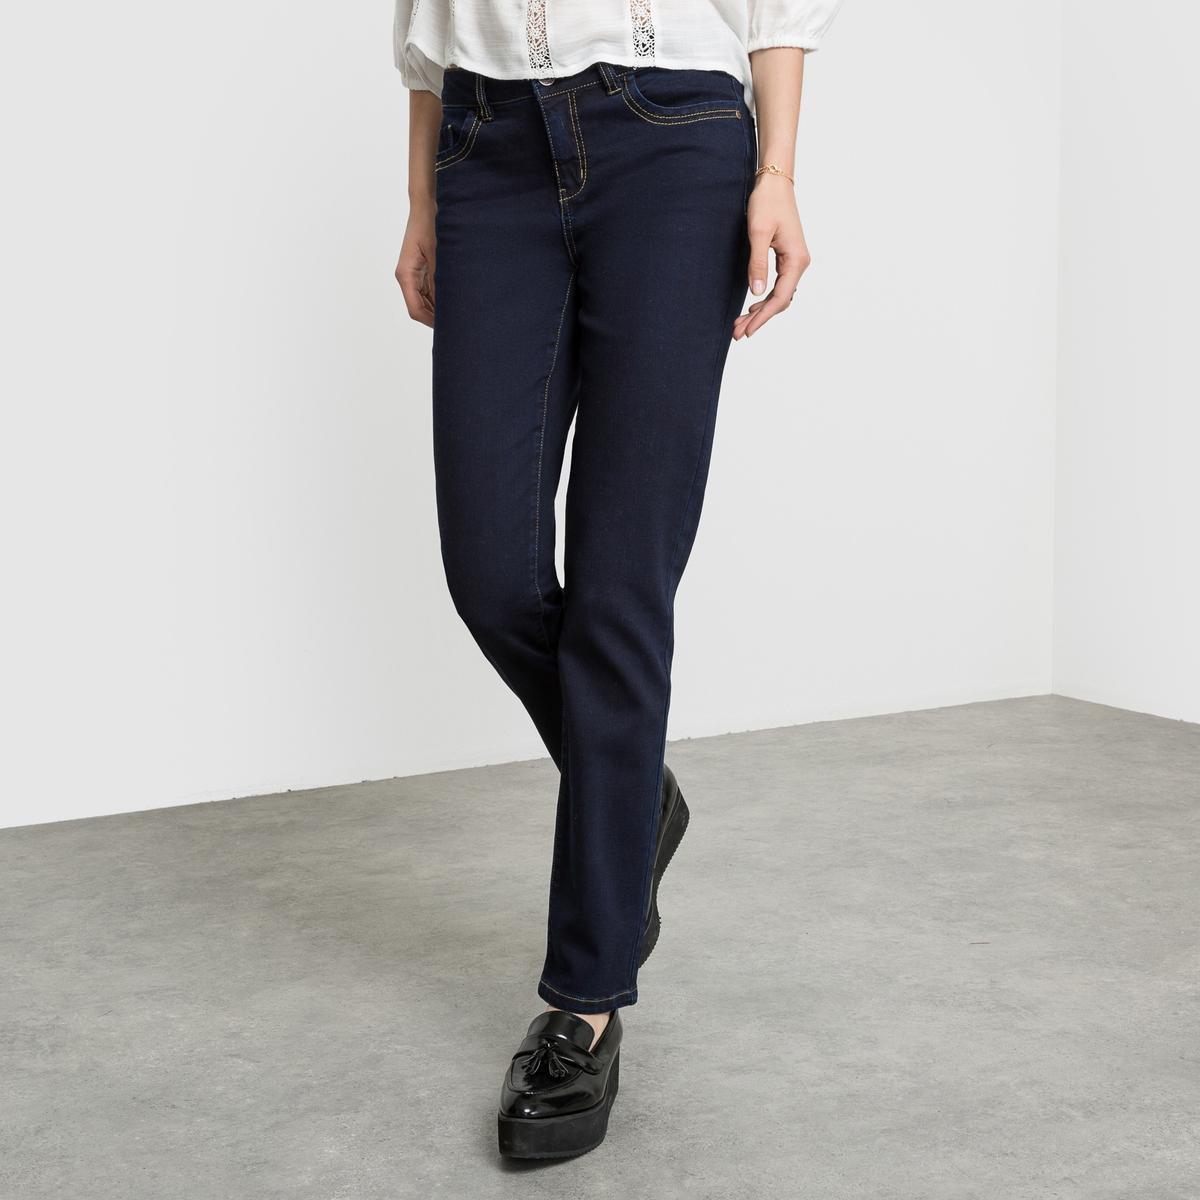 Jeans 5 tasche slim lunghezza 32